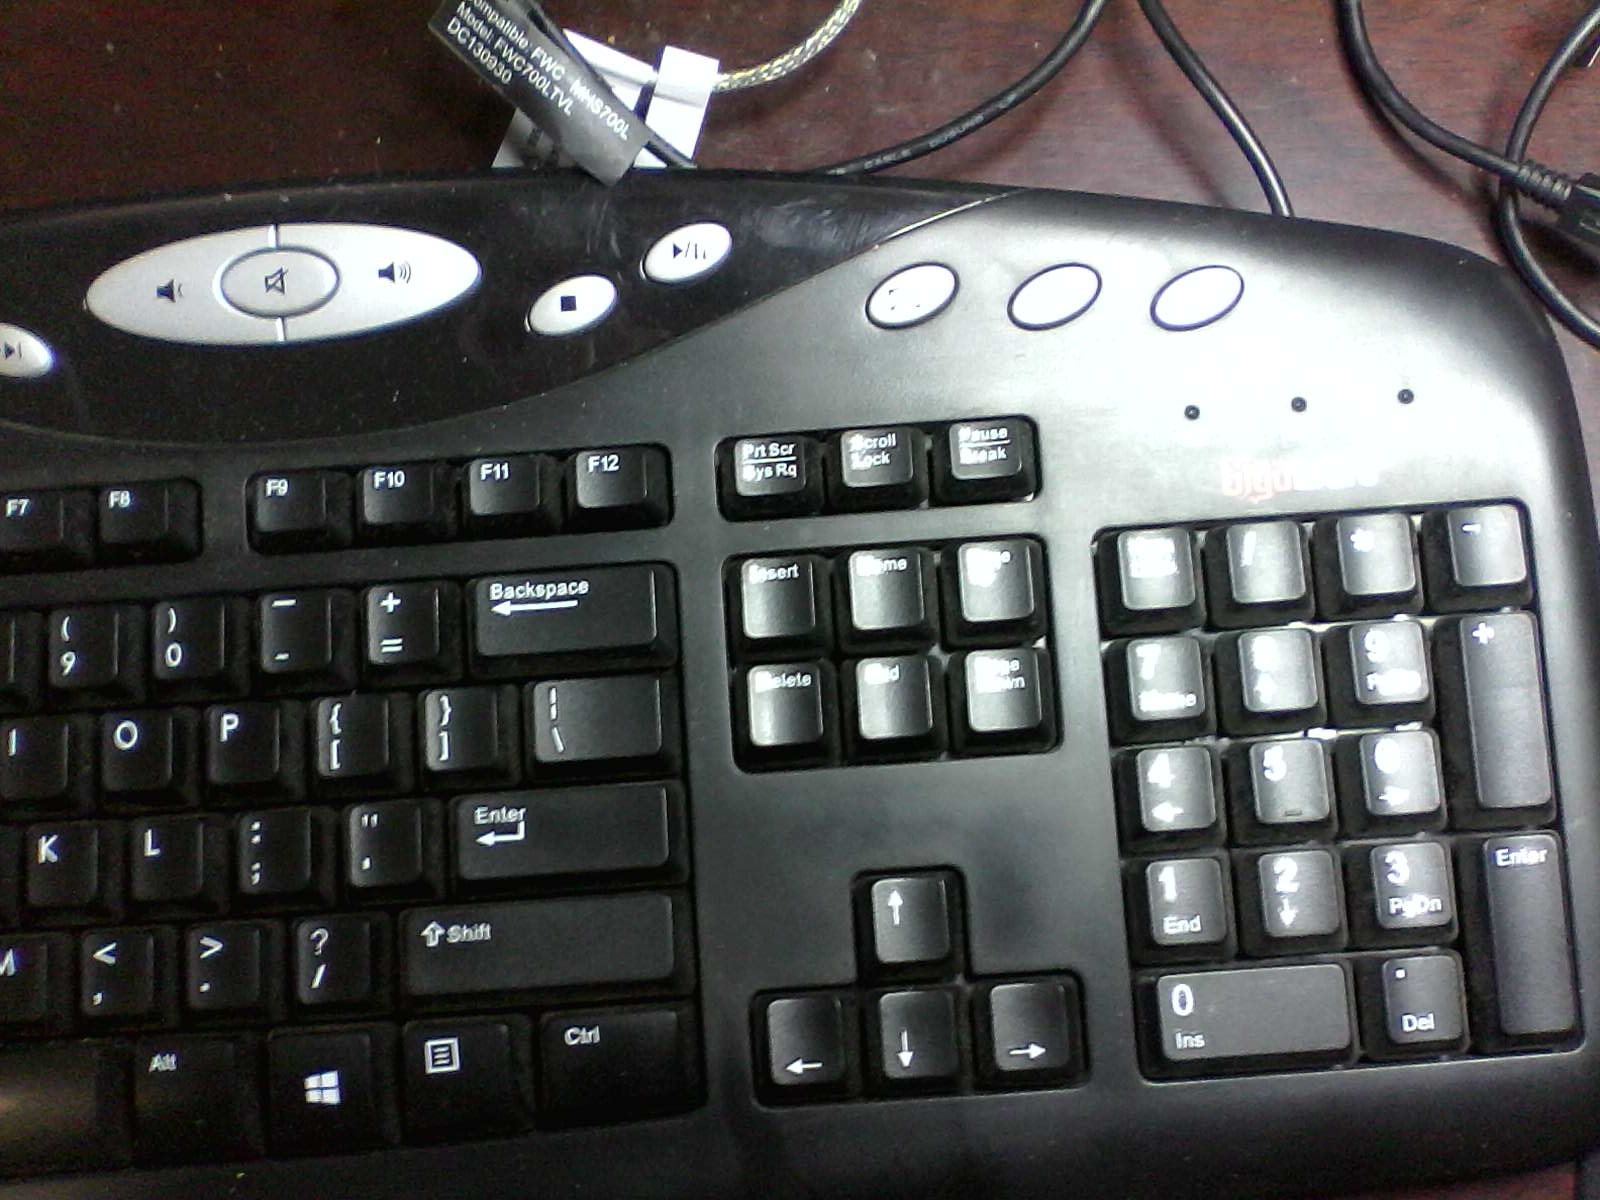 keyboard special keys image